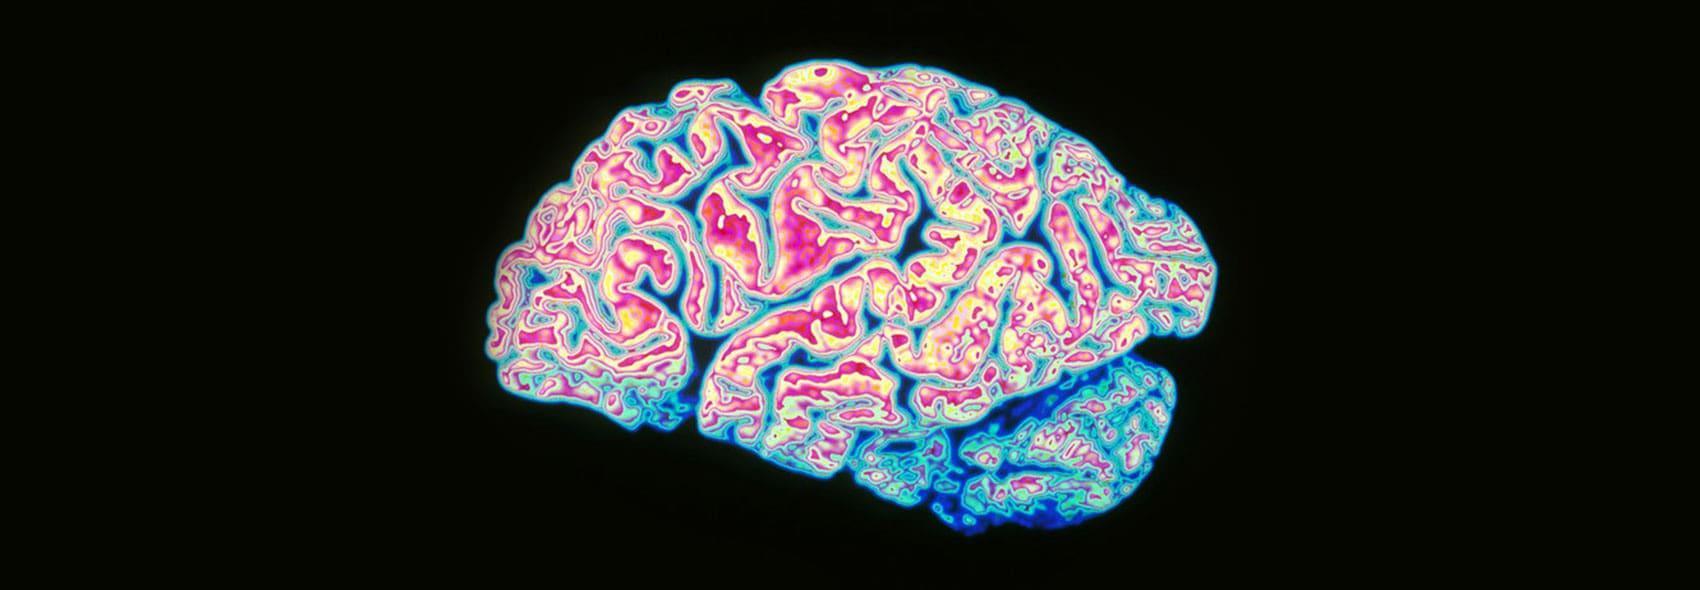 Brain health supplements LYMA 2